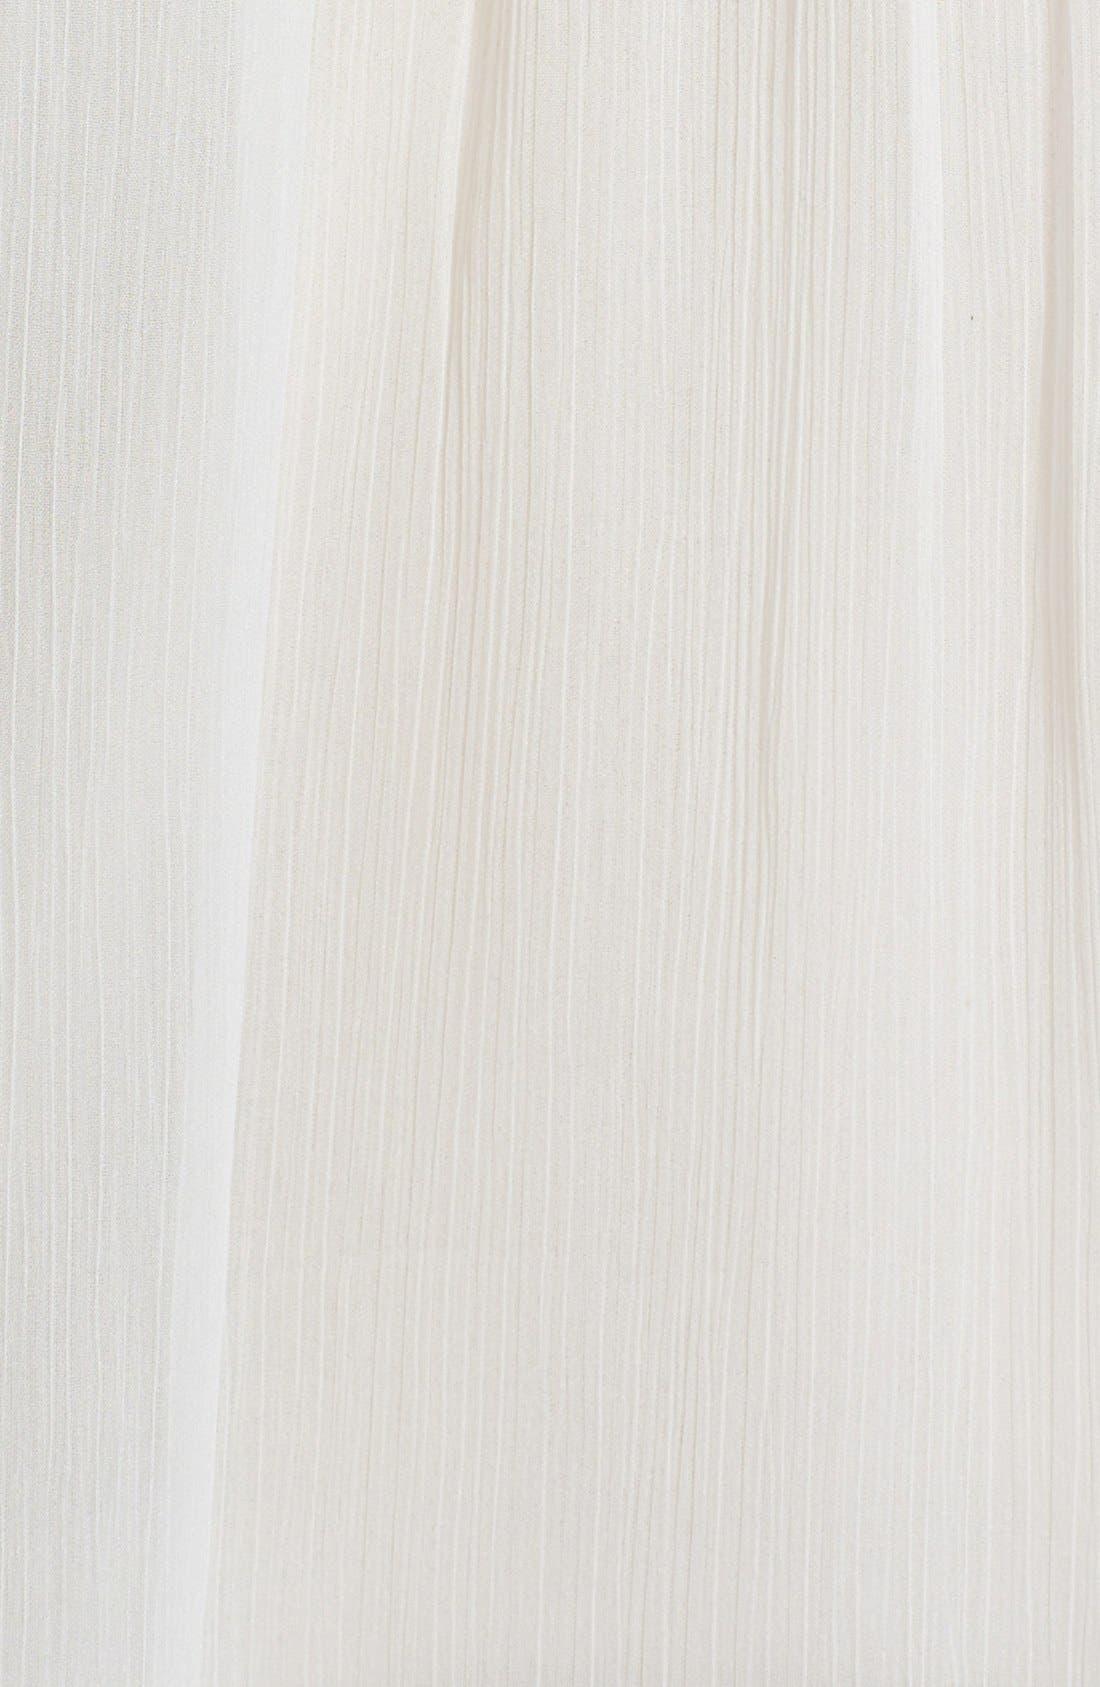 Alternate Image 3  - Jessica Simpson 'Symphony' Embroidered Peasant Blouse